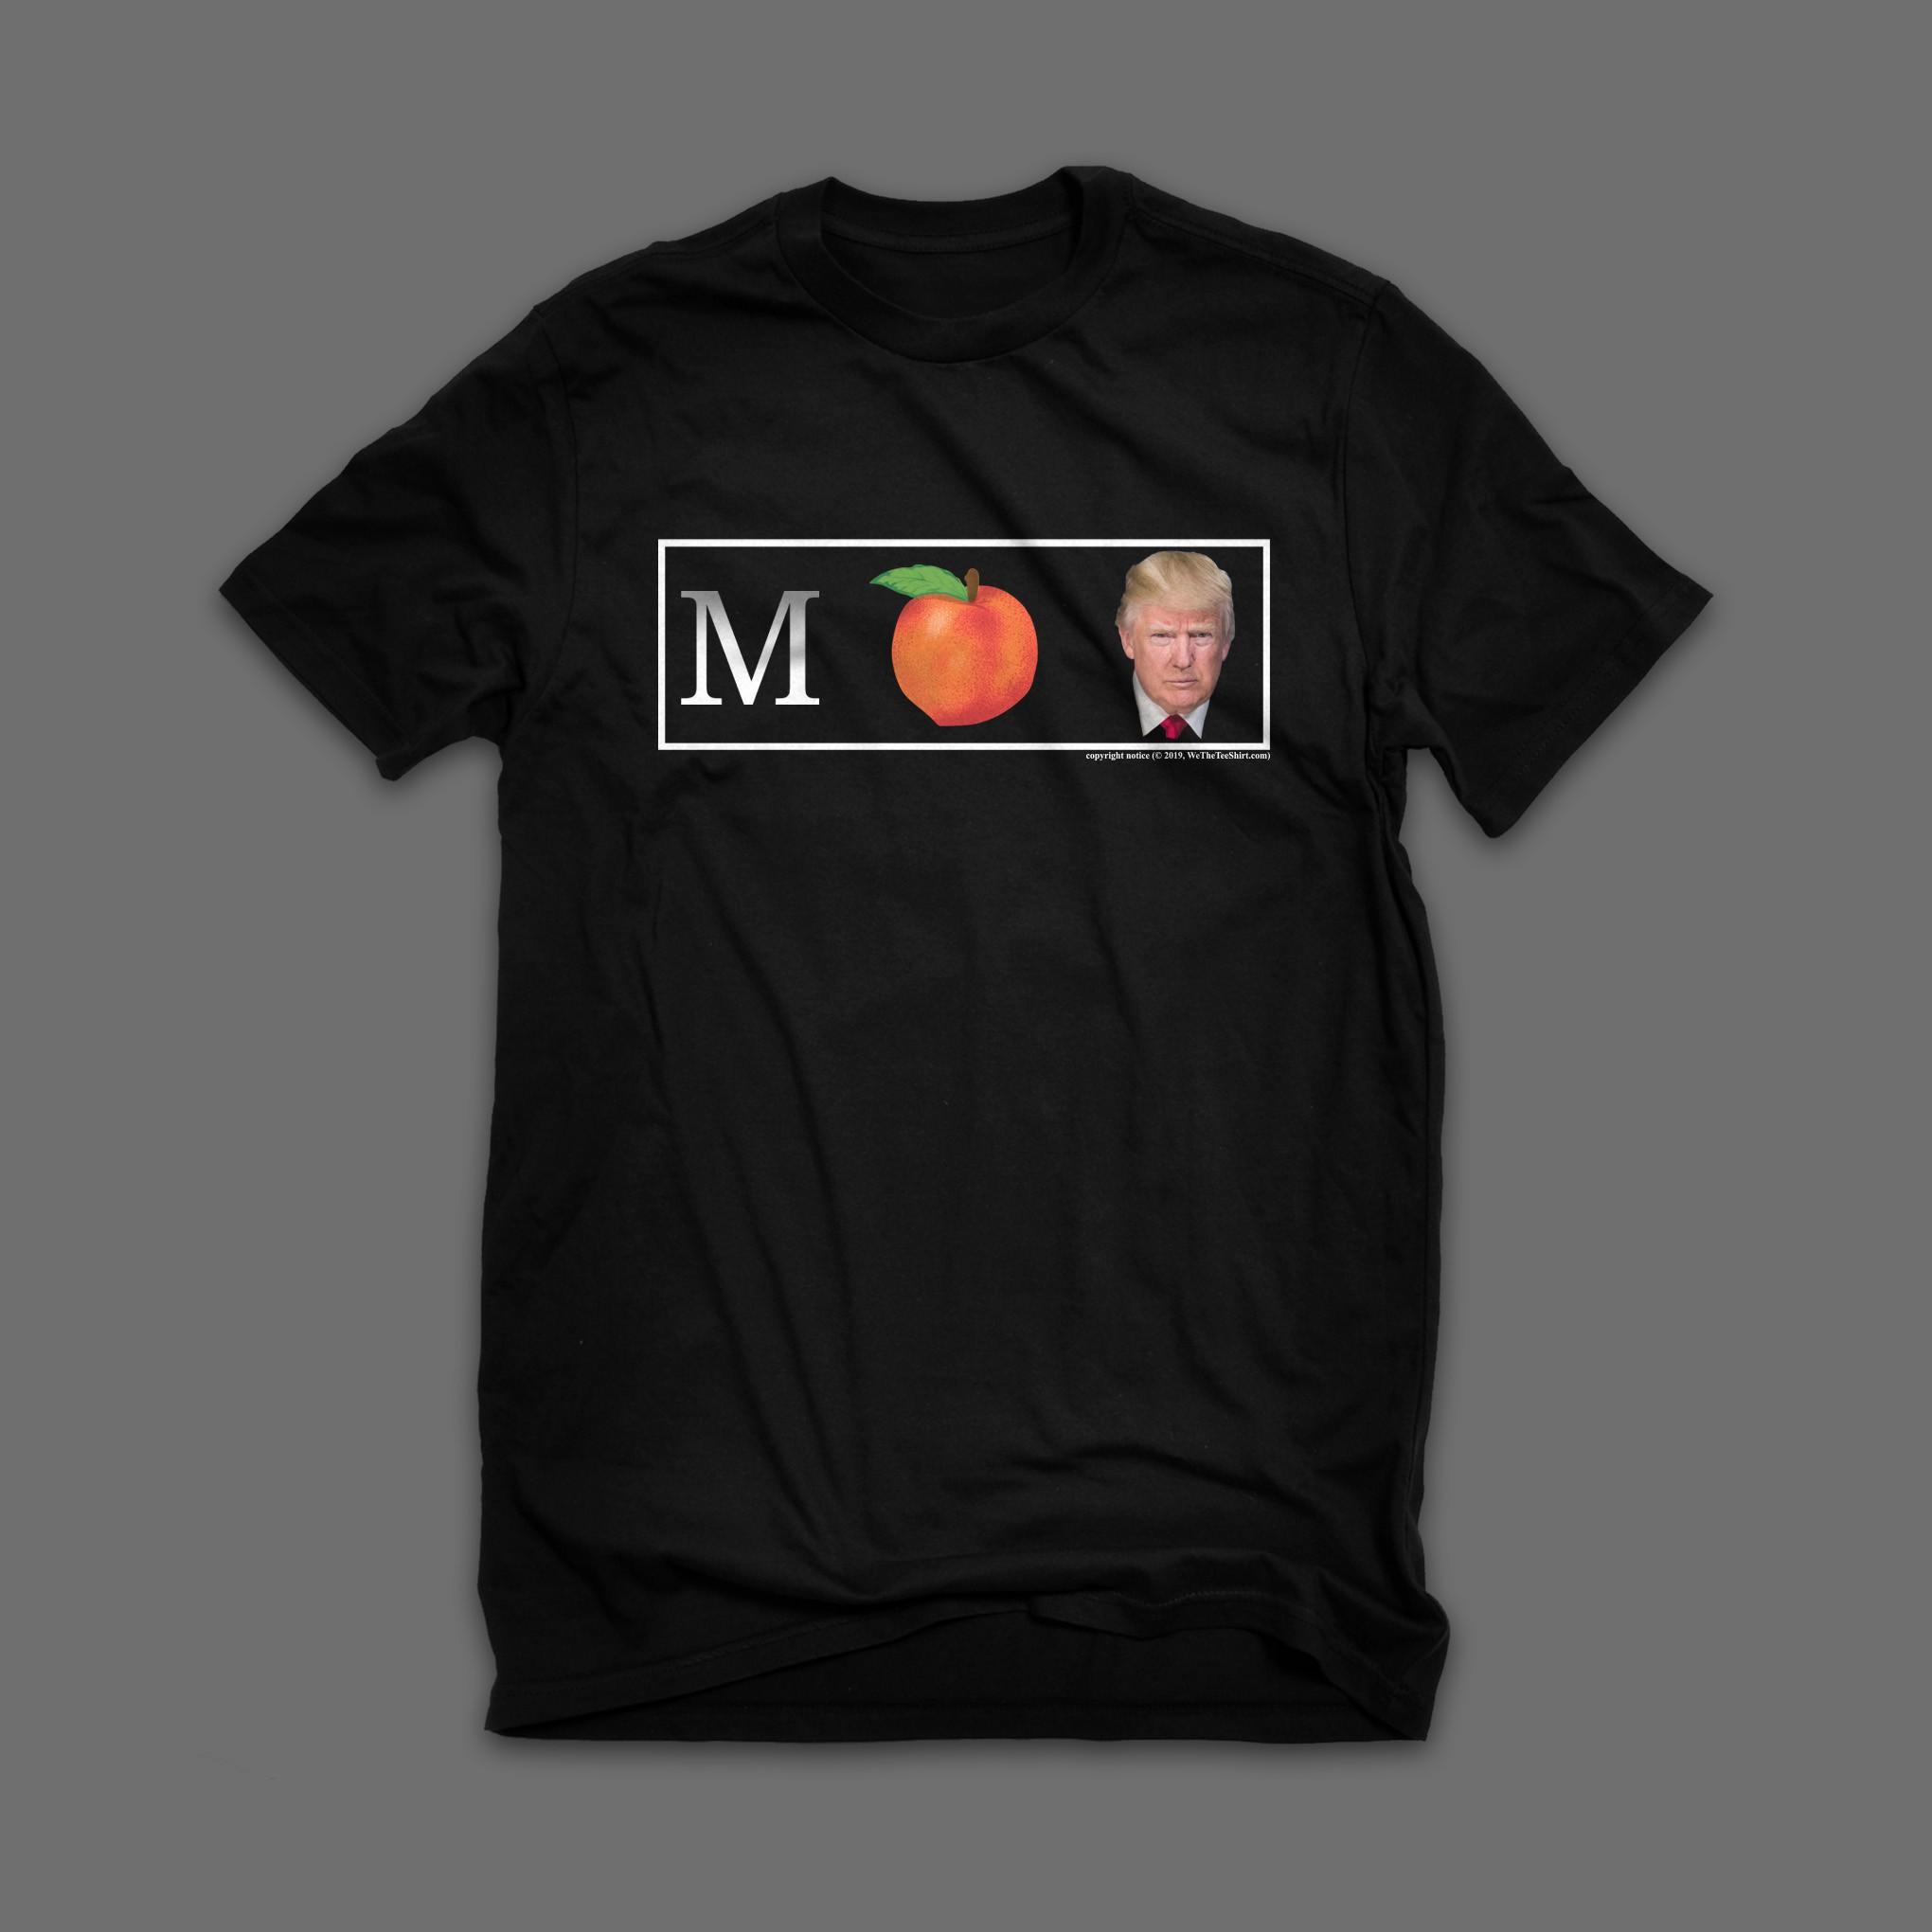 Anti-Trump T-shirt design